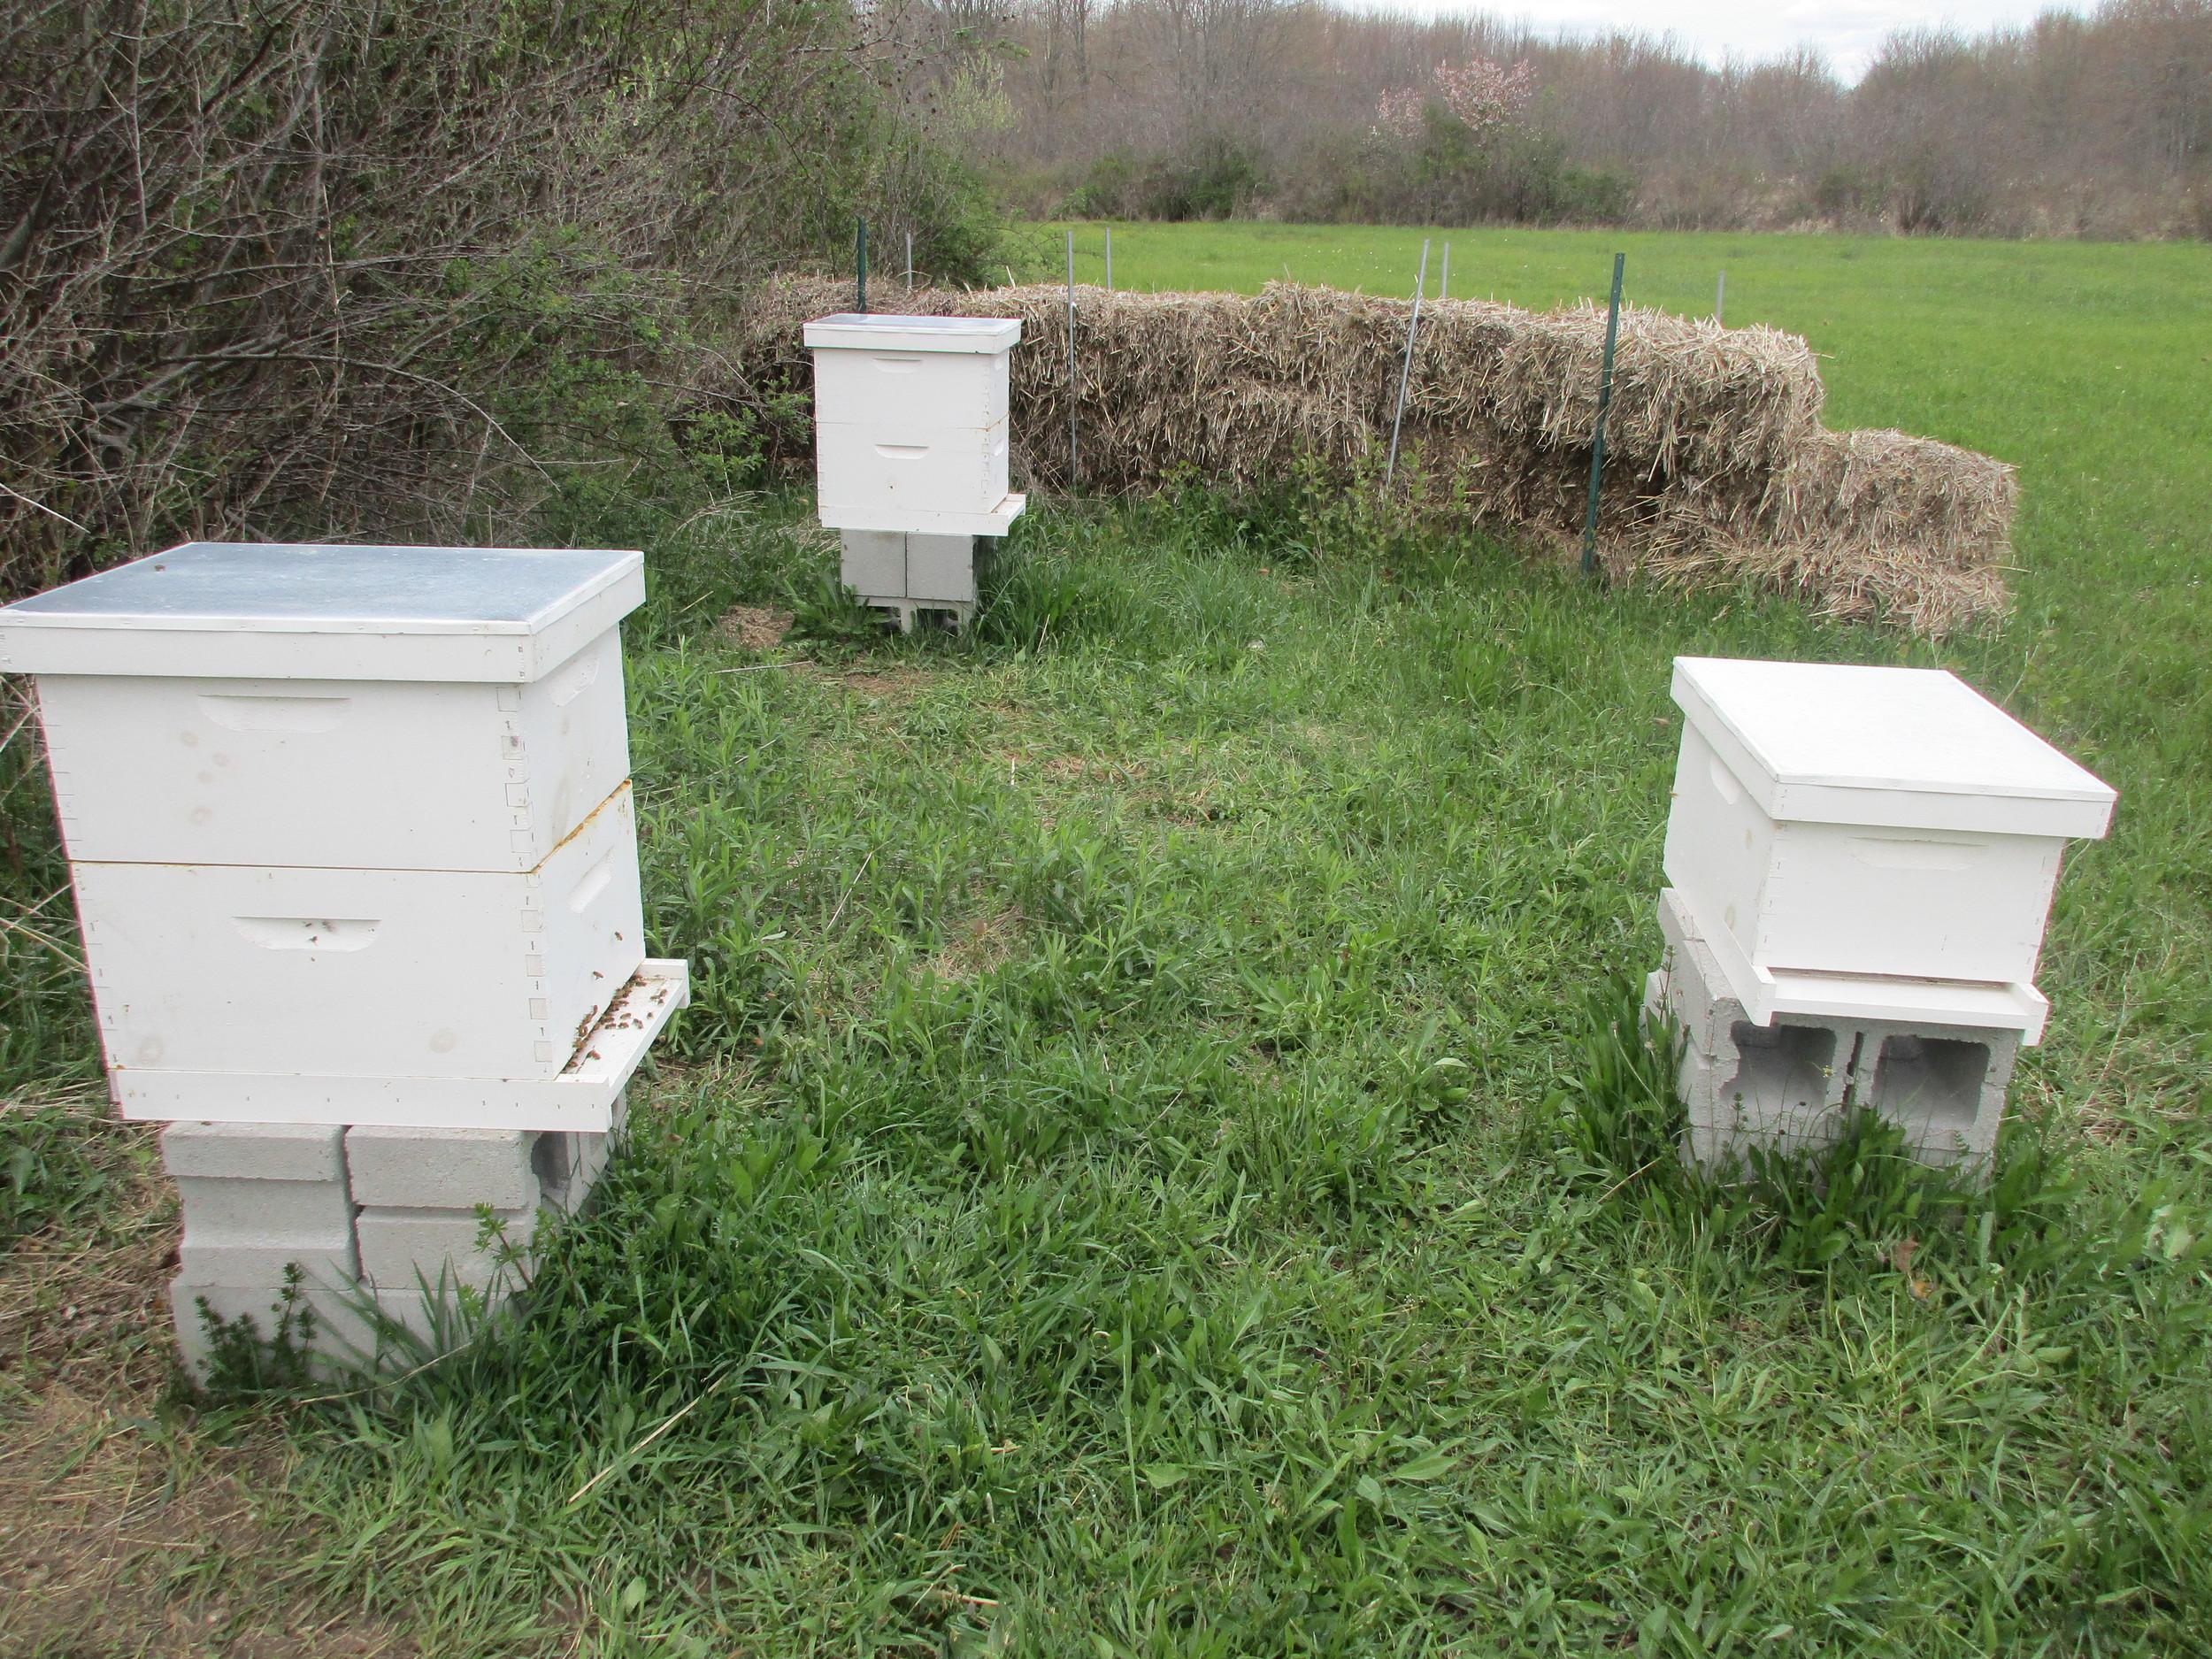 Now three hives!